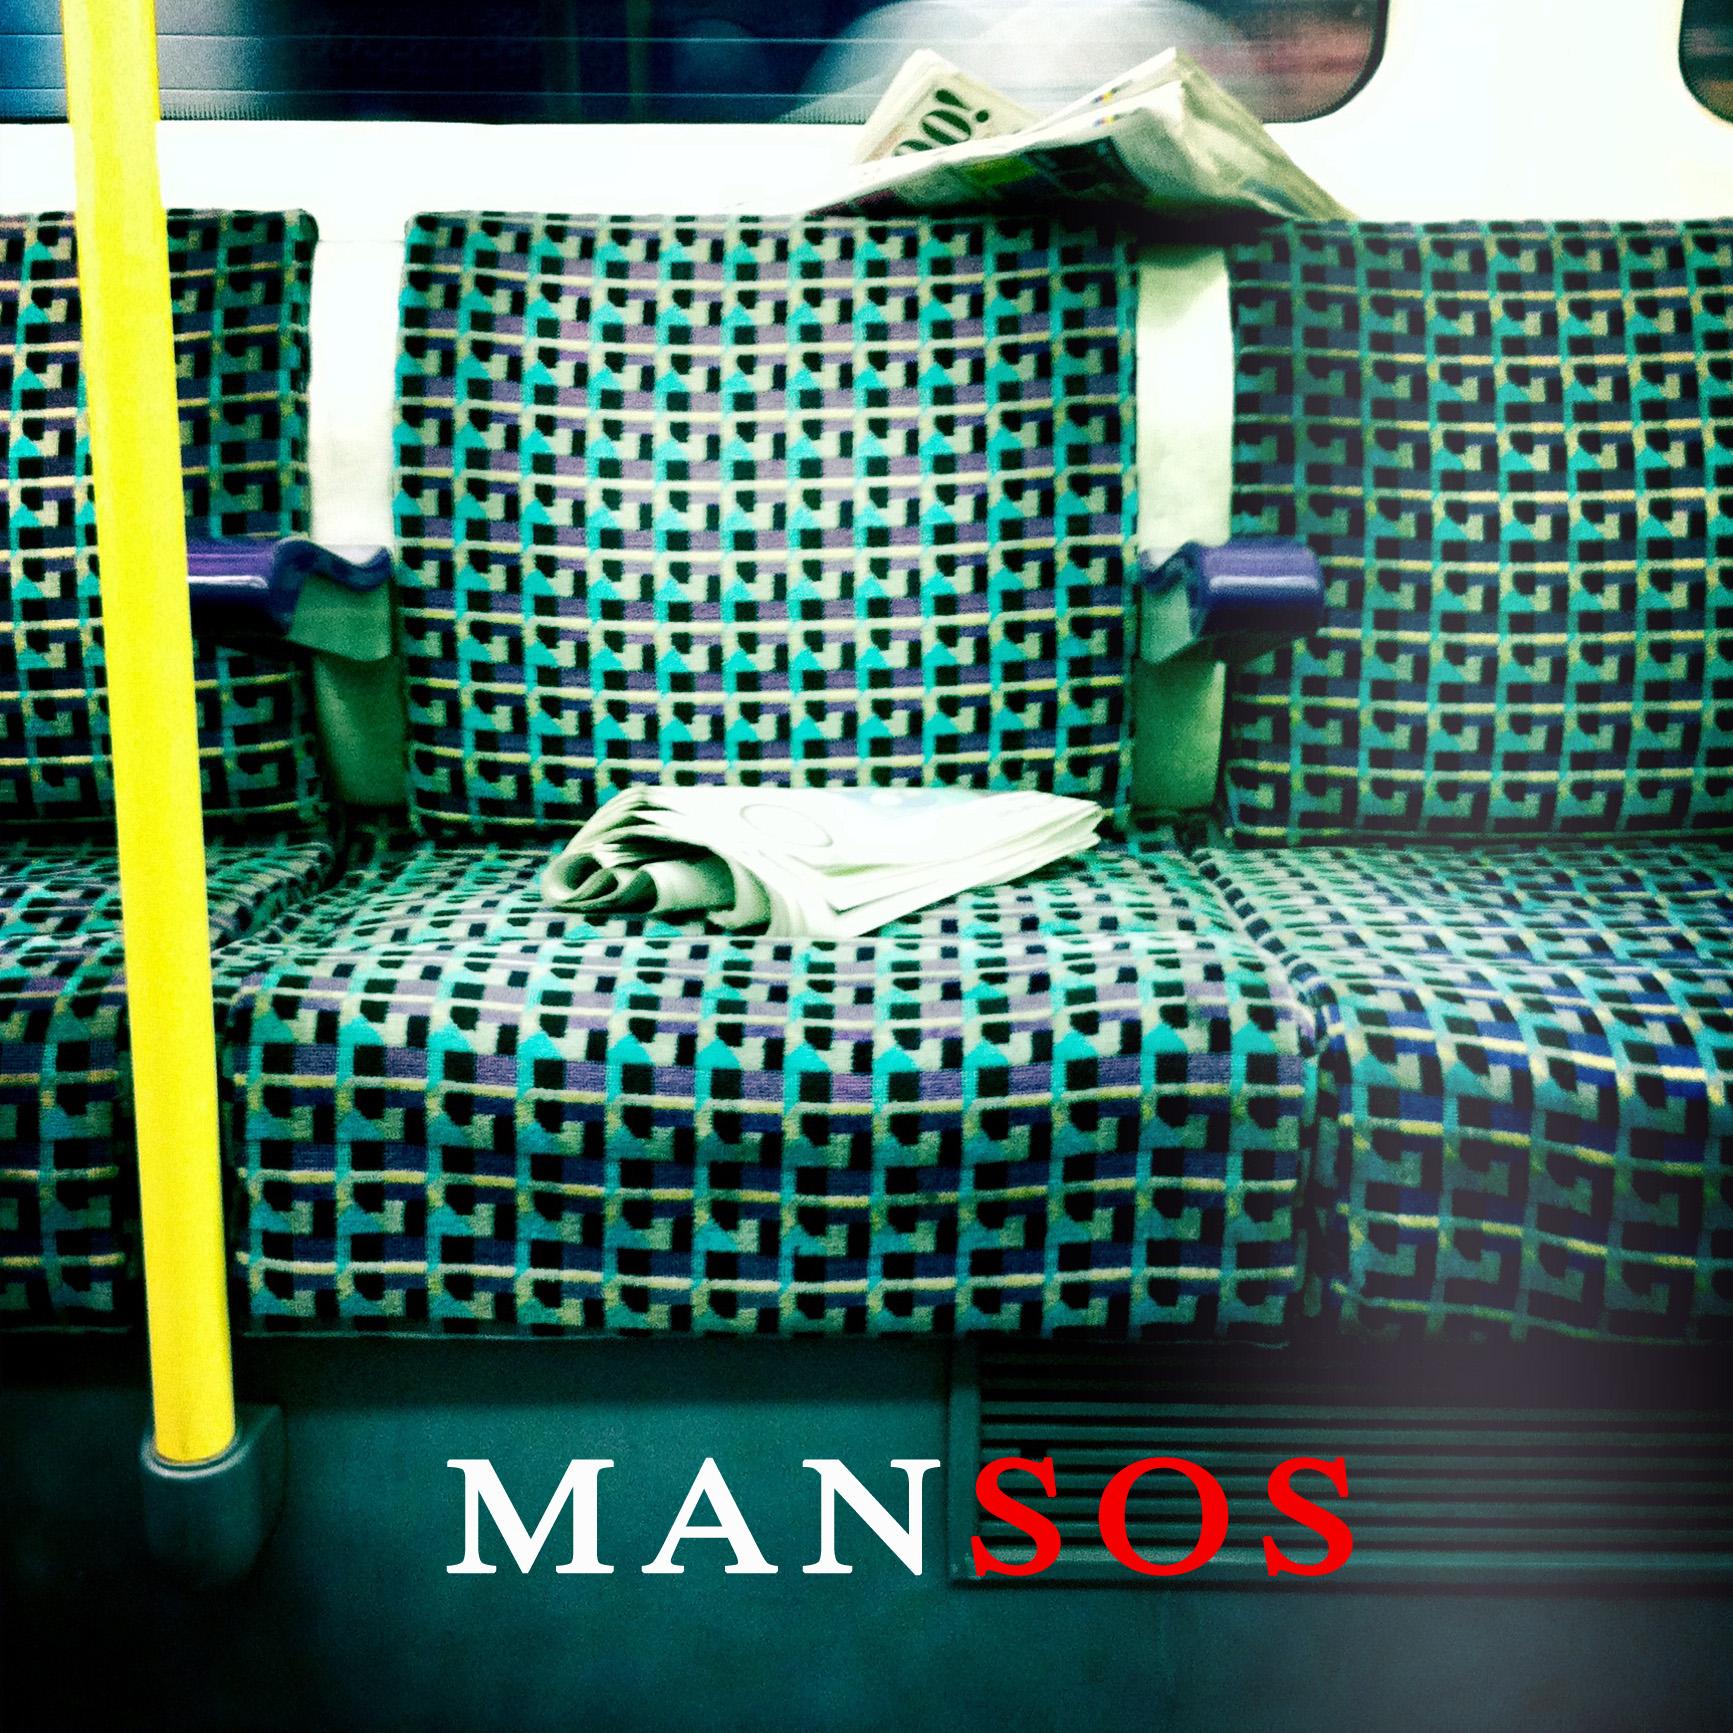 Mansos